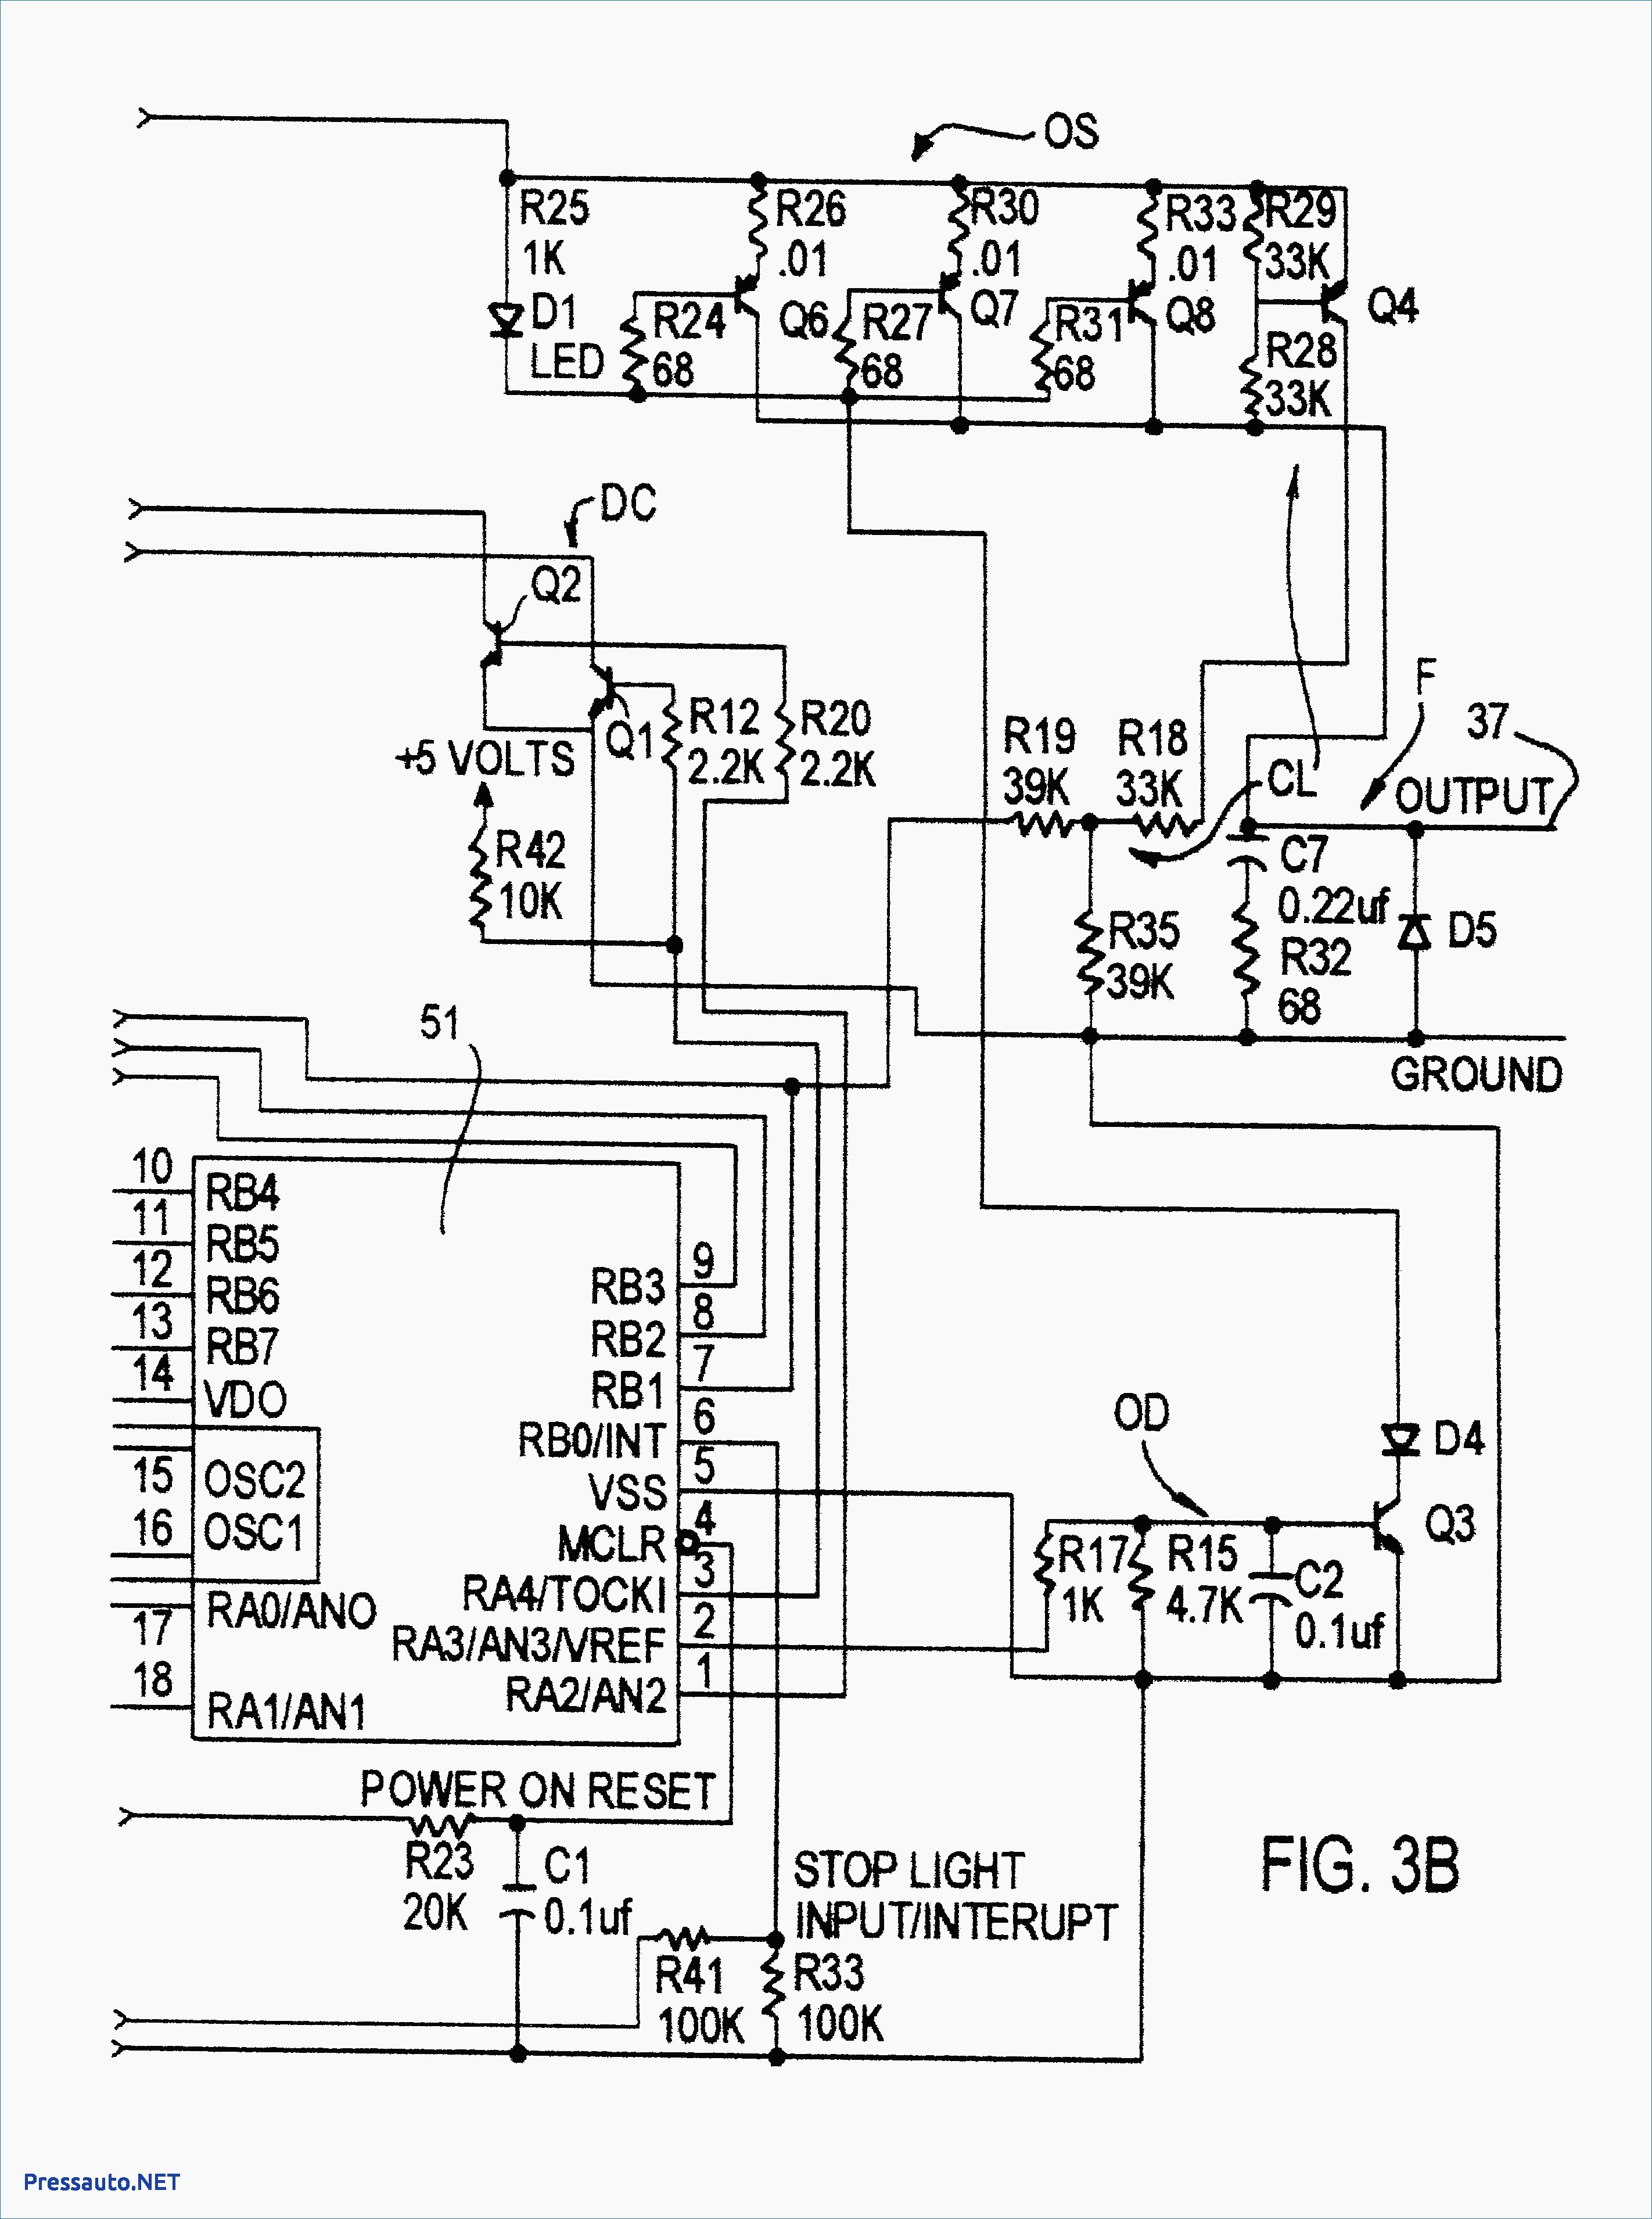 Wiring Diagram Electric Trailer Brake Control Pressauto NET At Controller